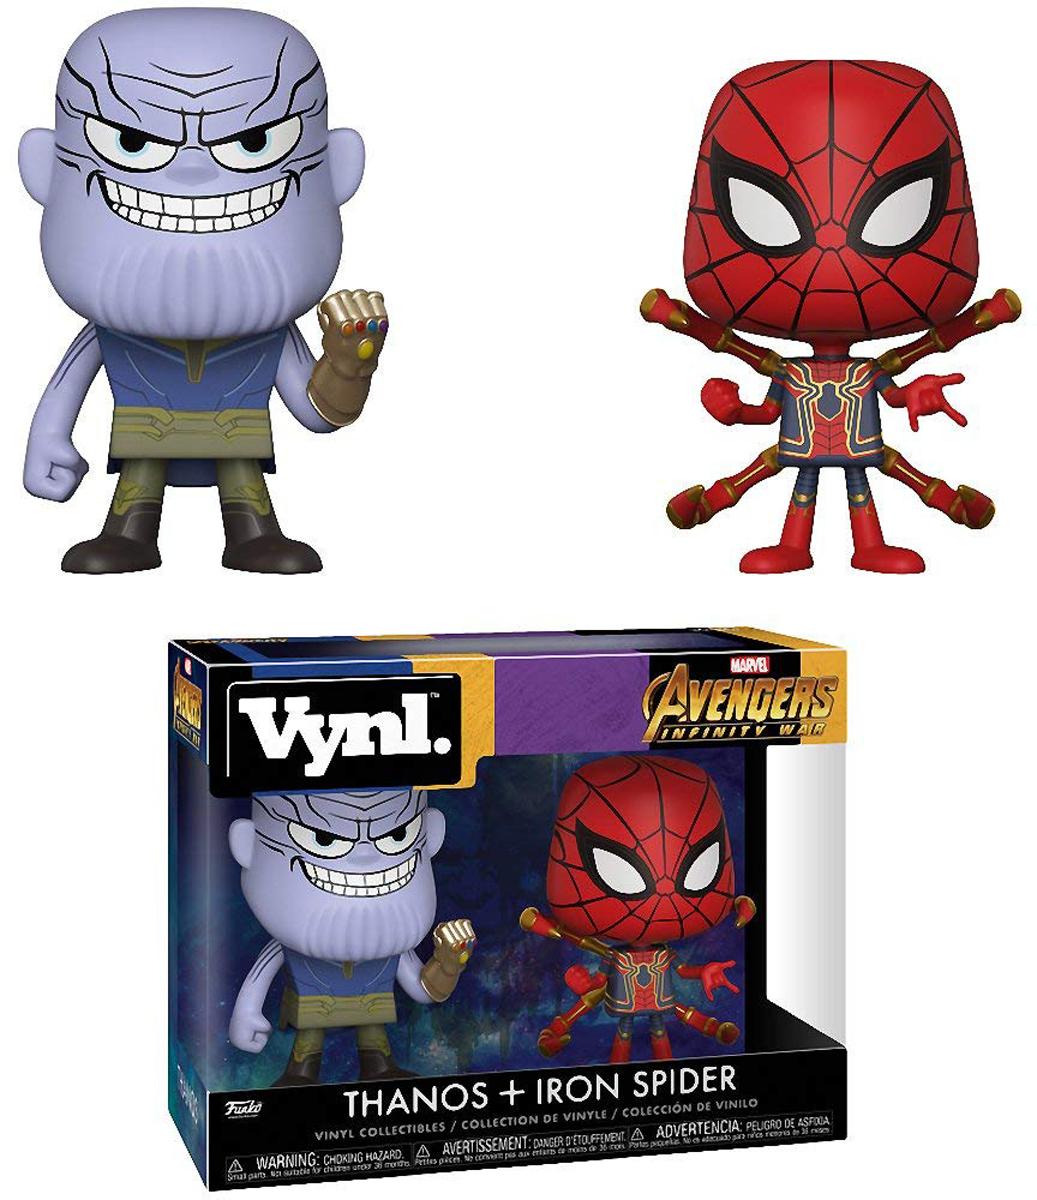 Funko POP! Vinyl Фигурка Marvel: Avengers Infinity War VYNL 1 30932